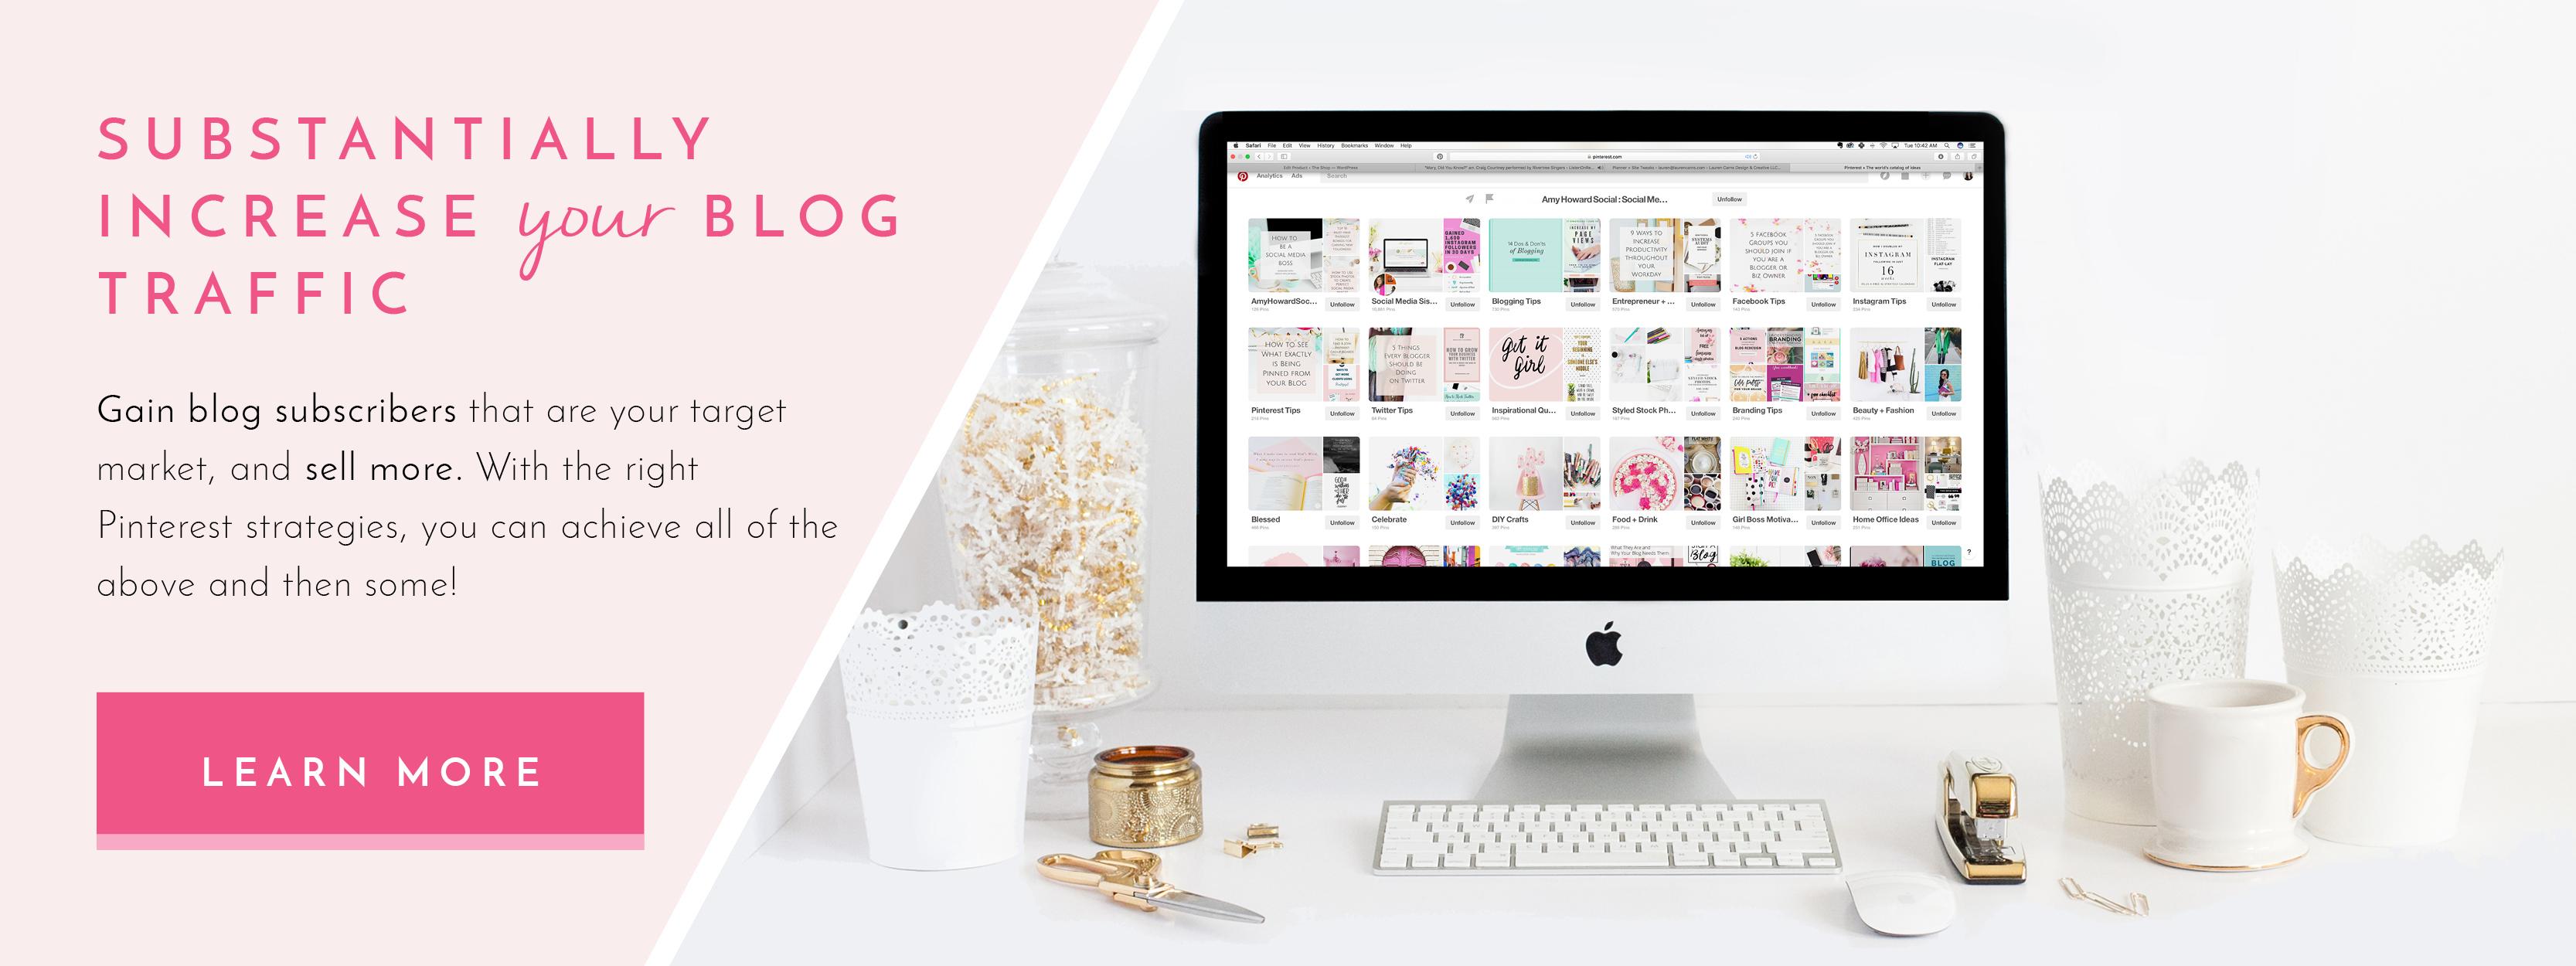 Pinterest Services - Amy Howard Social